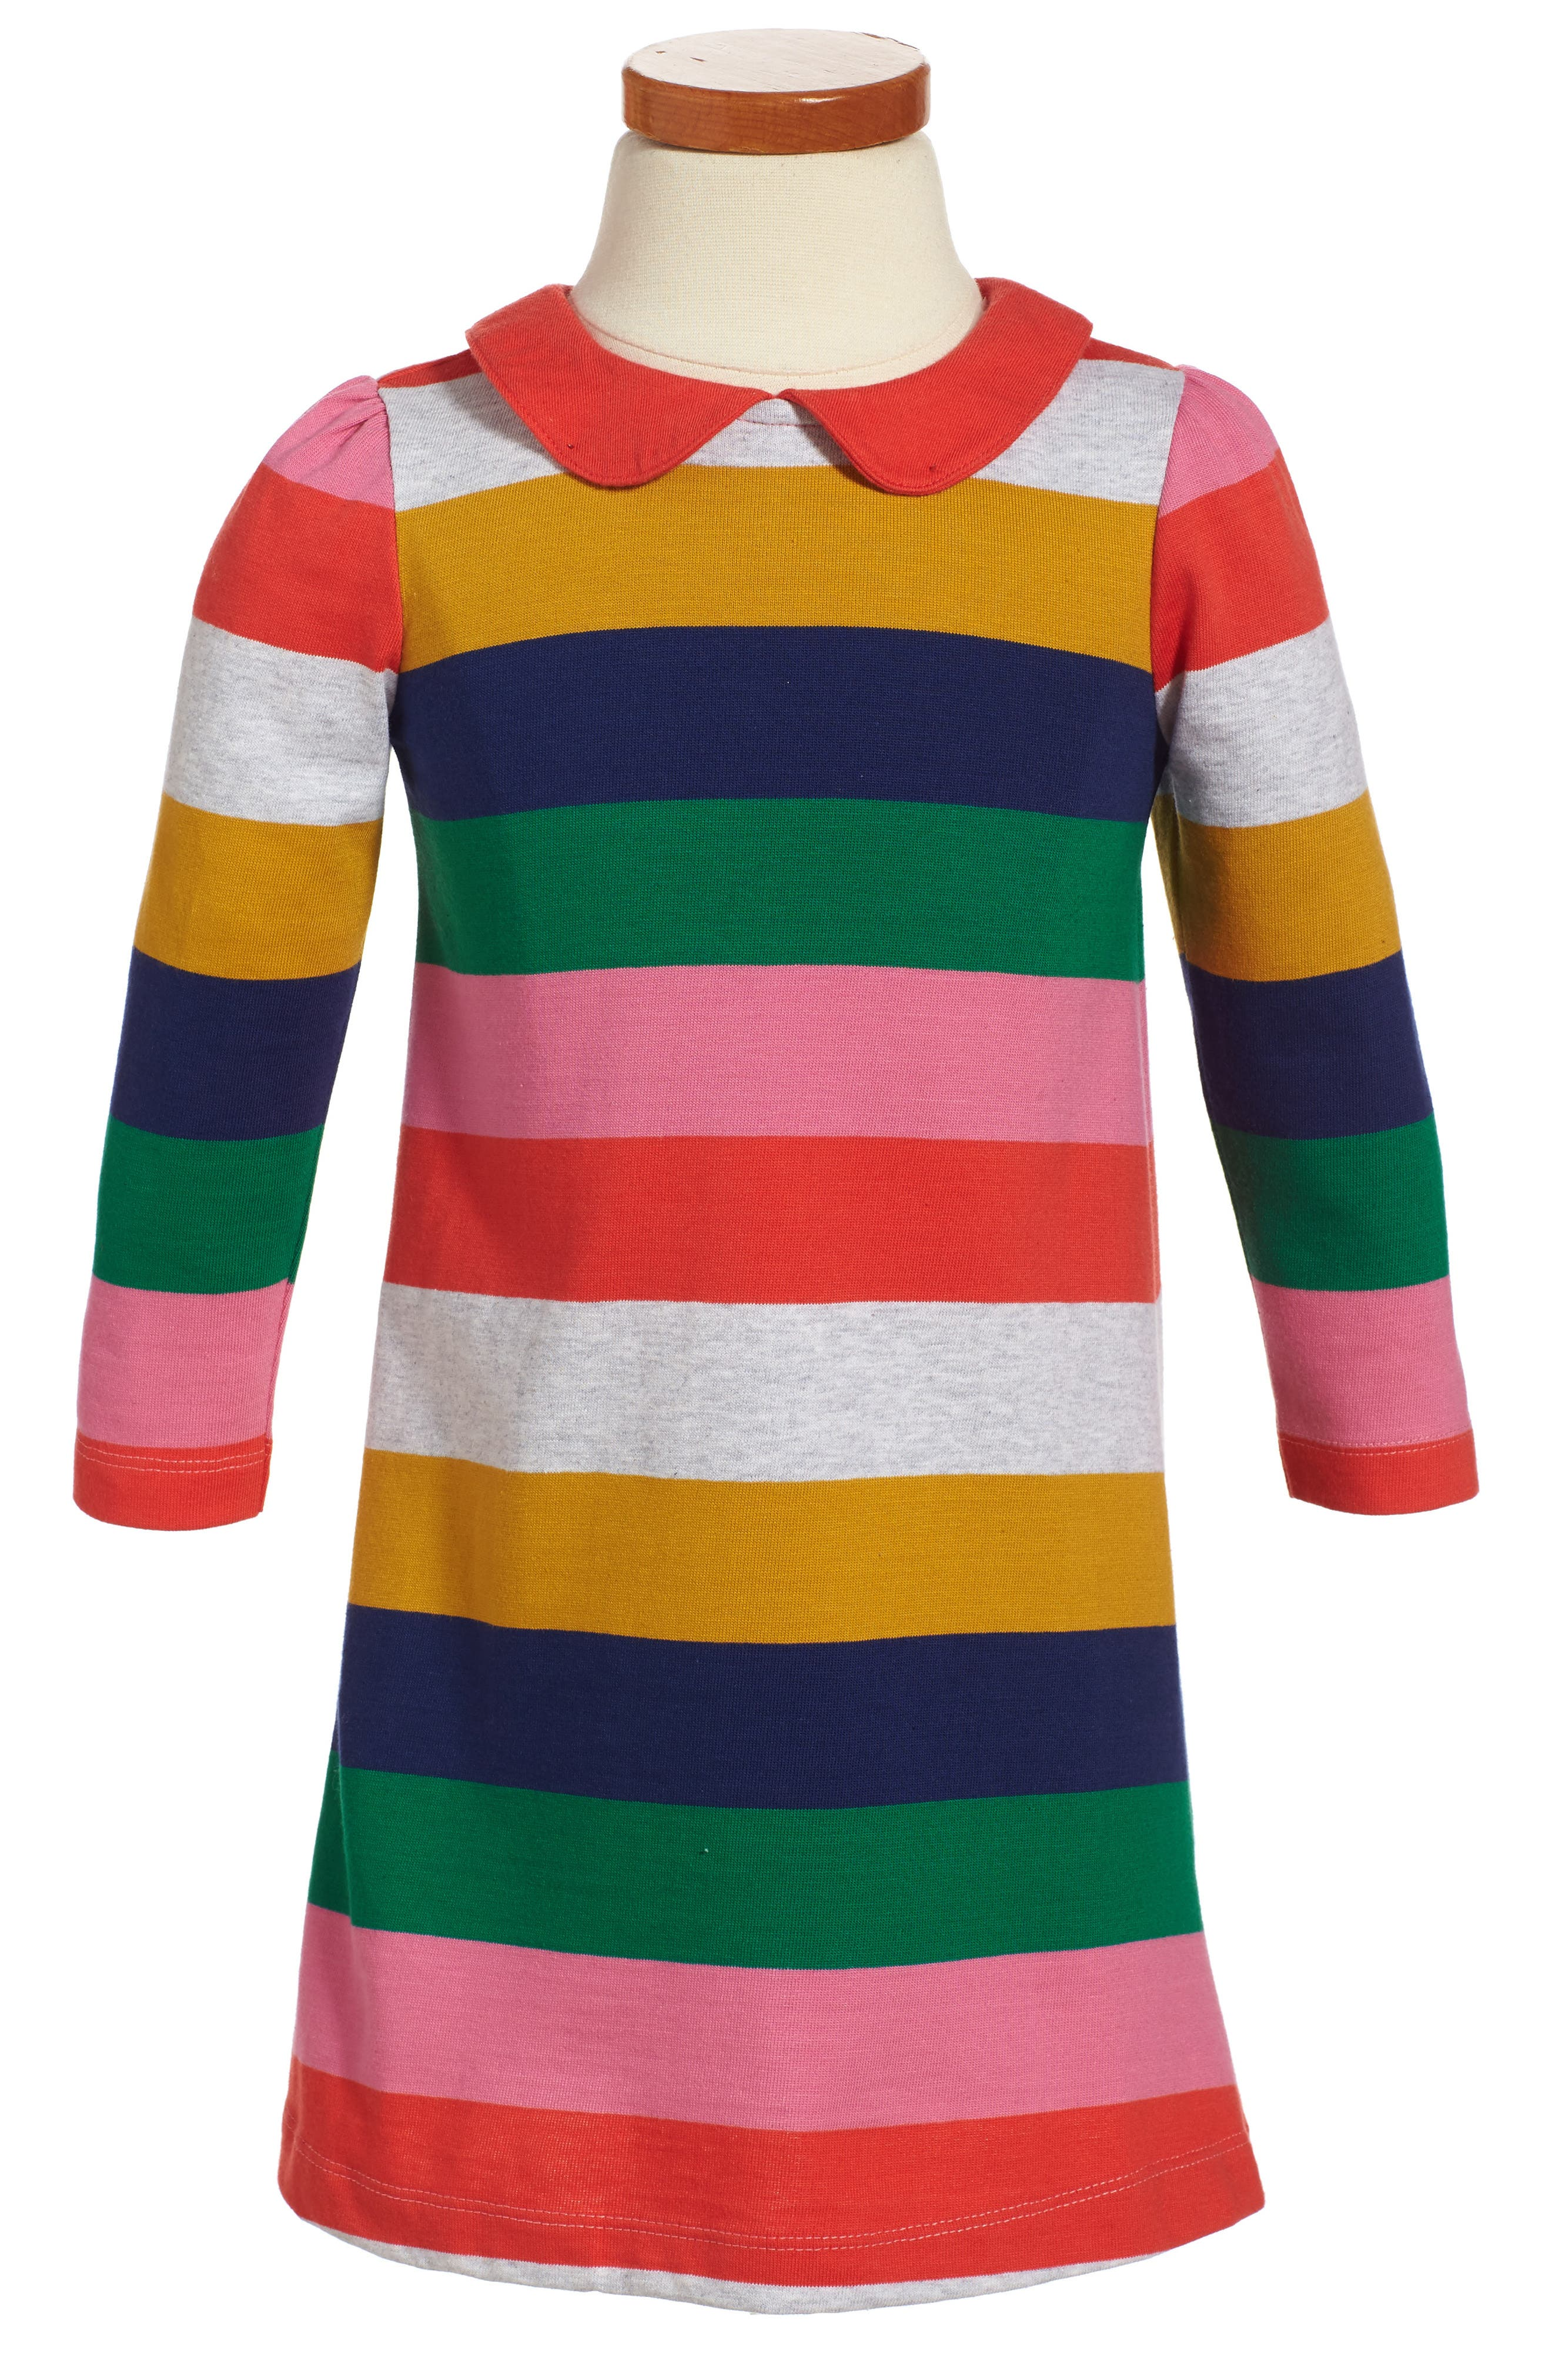 Main Image - Mini Boden Collared Jersey Dress (Toddler Girls, Little Girls & Big Girls)